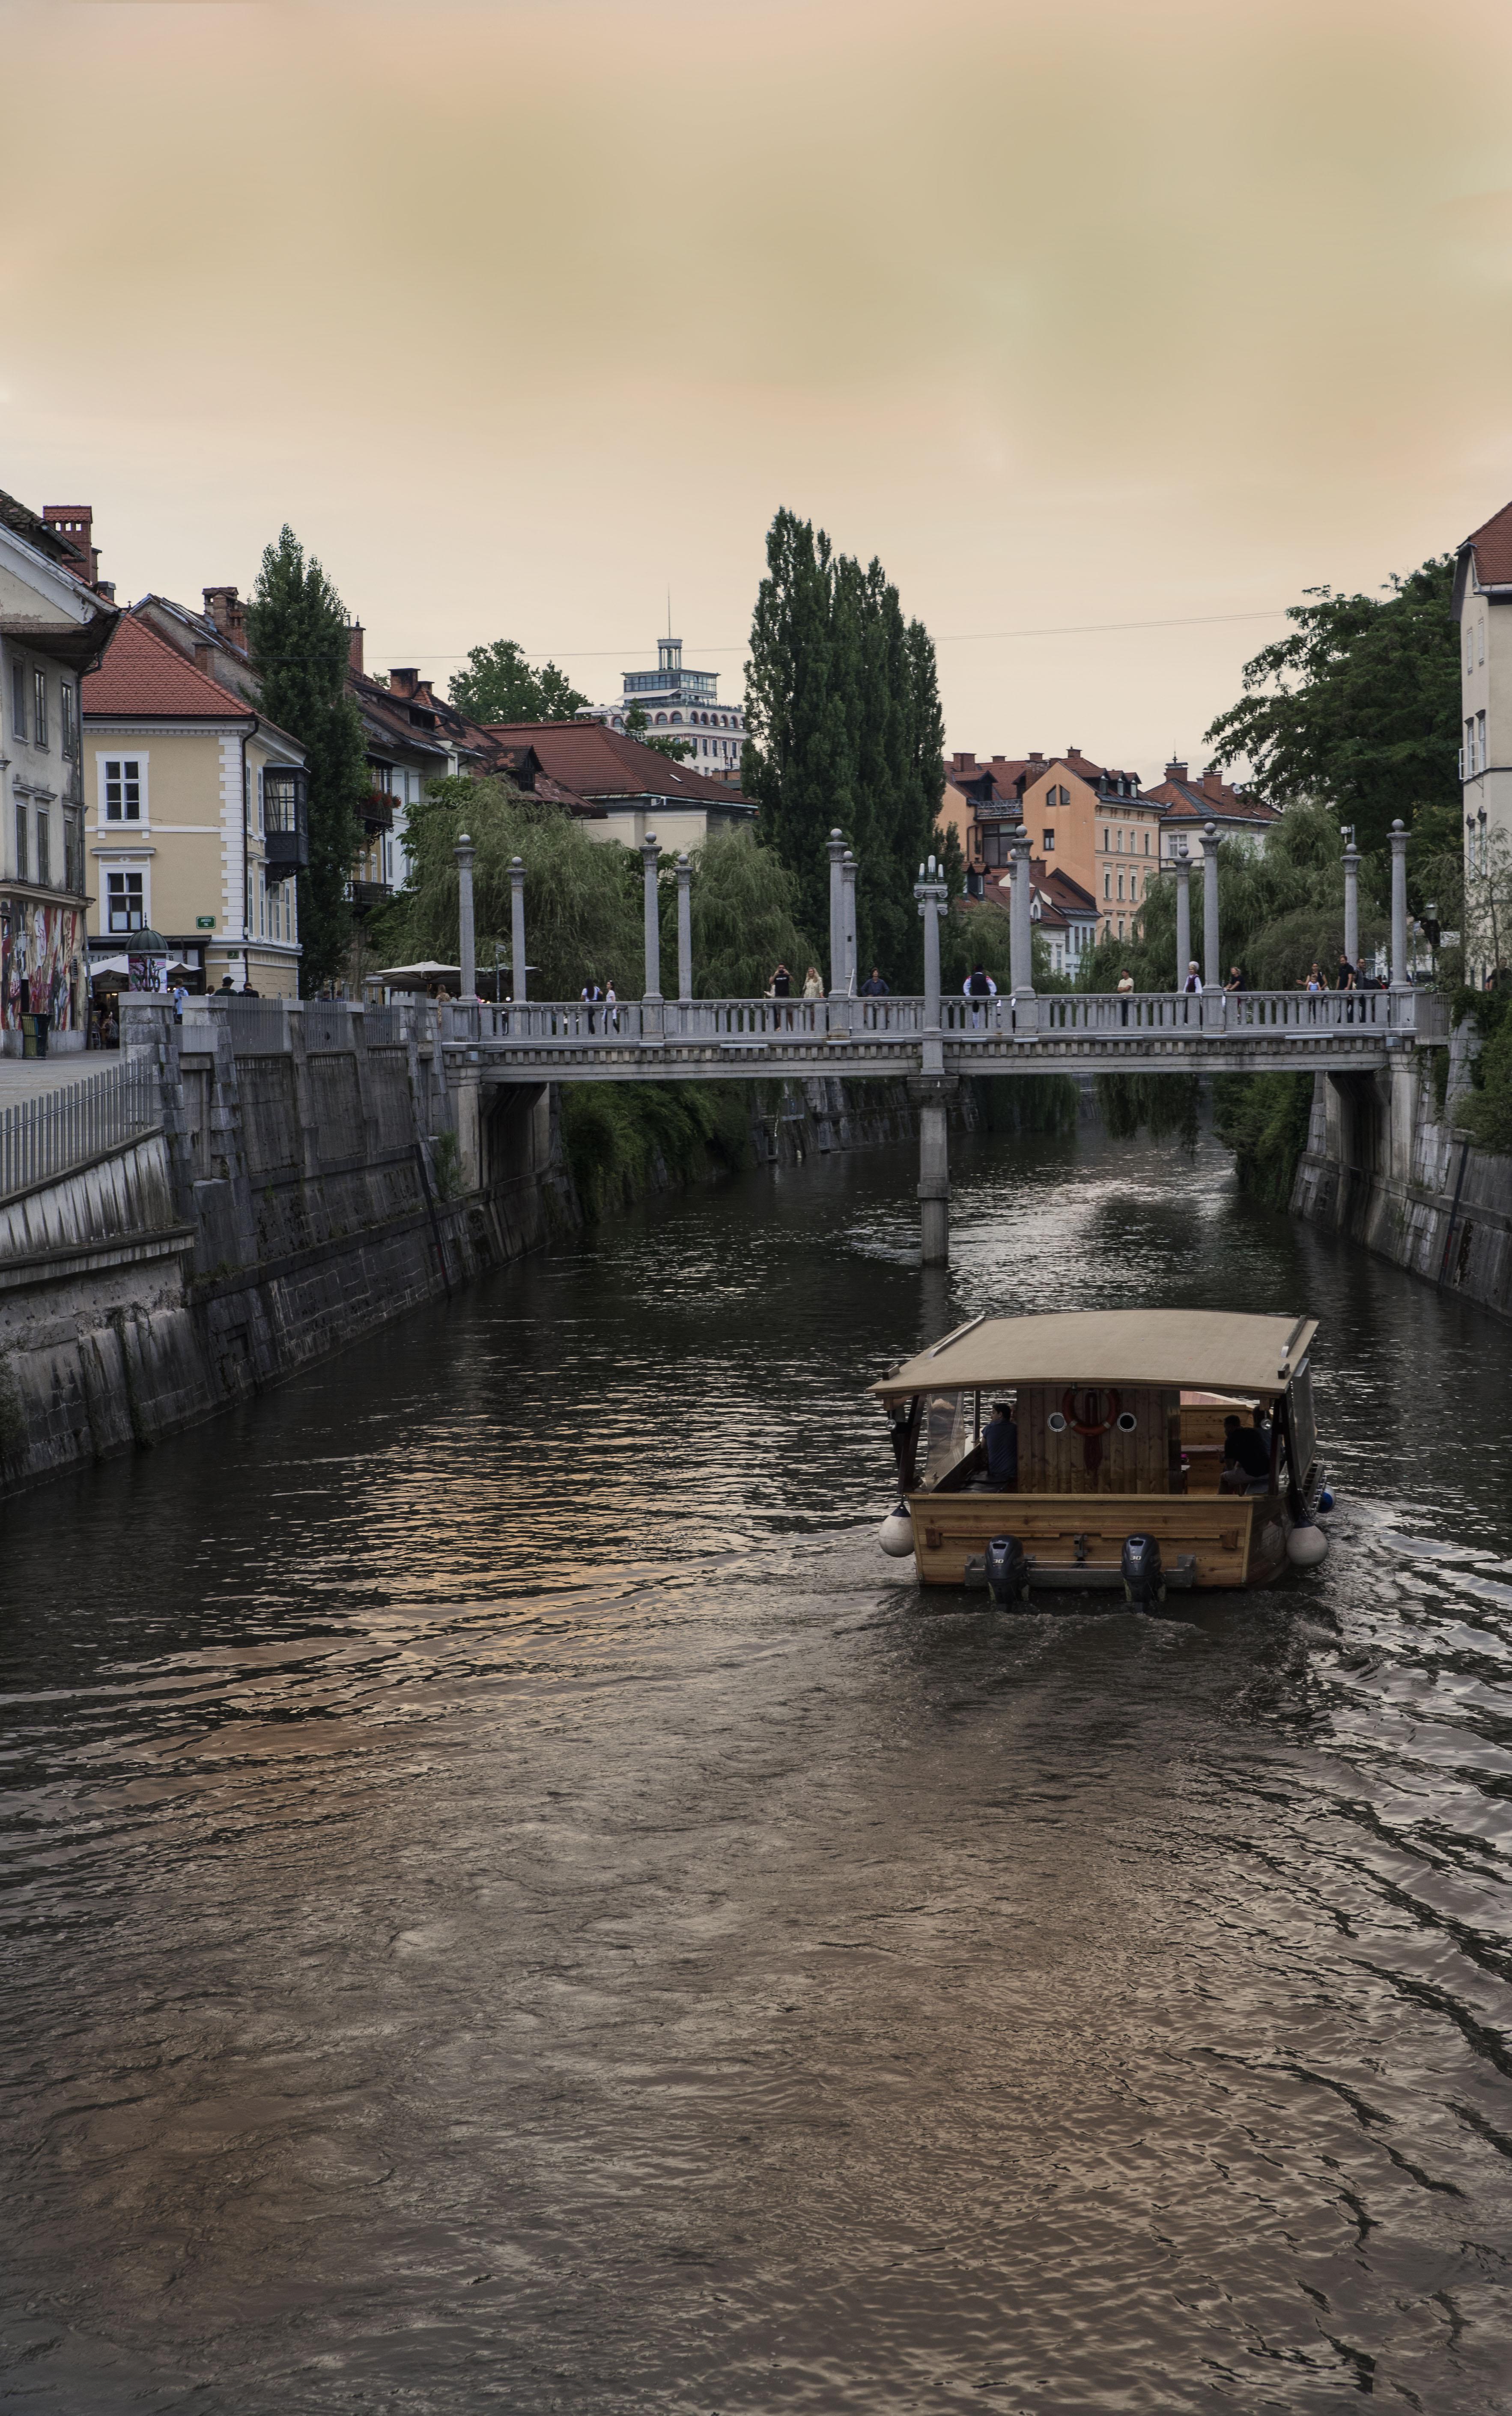 Ljubljanai folyó<br />Sandor Adasz Photography<br />All right reserved